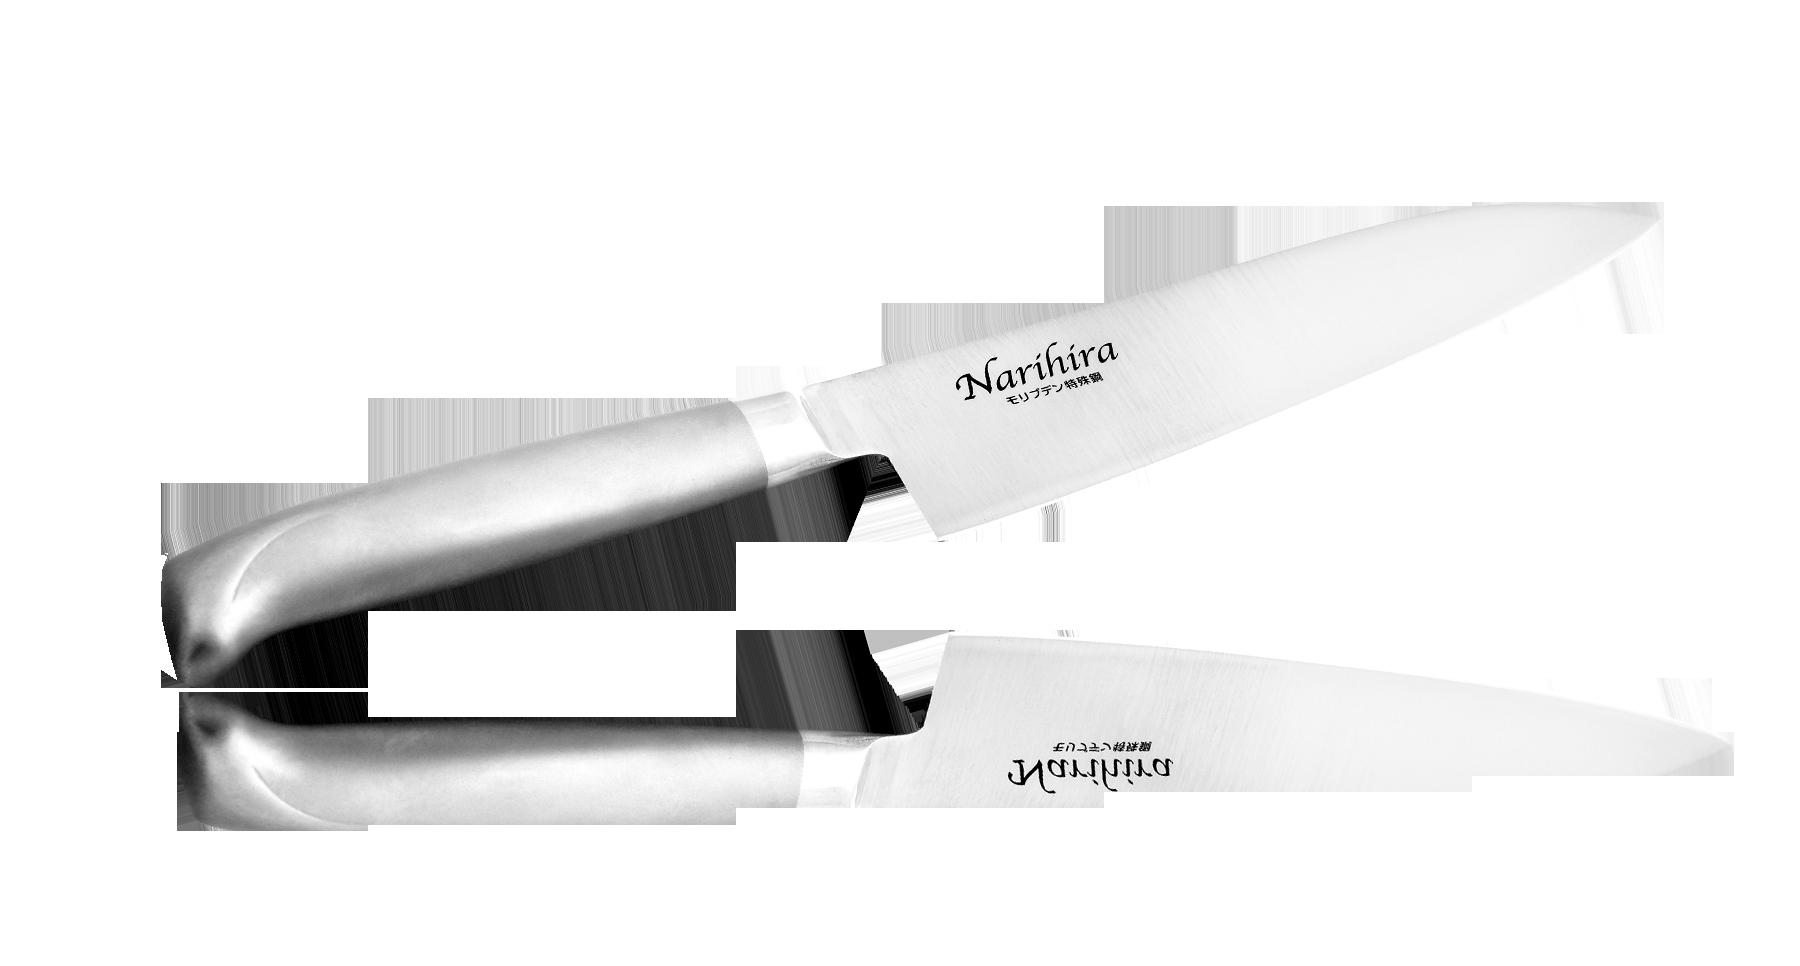 Нож Сантоку Narihira 180 мм, сталь AUS-8, стальная рукоять